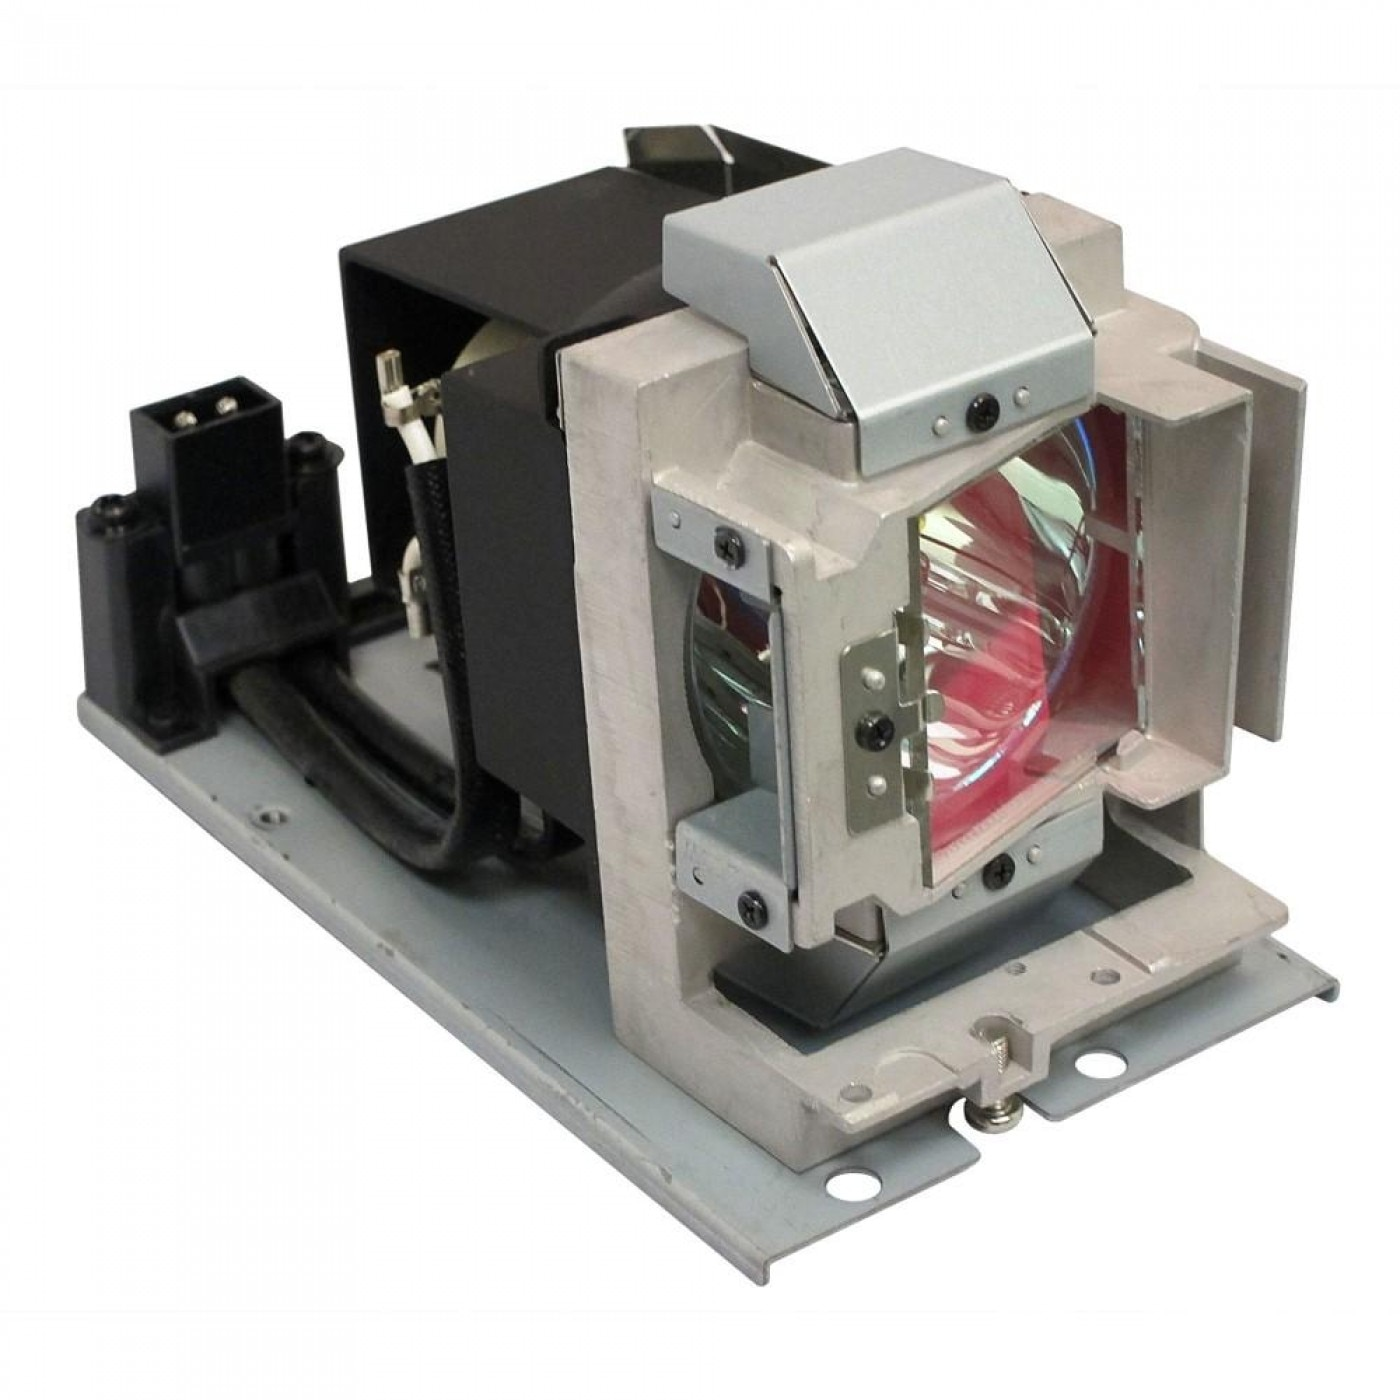 Конкурентная прожекторная лампа для CANON LV-LP41,0740C001,LV-WX300UST,LV-WX300USTi